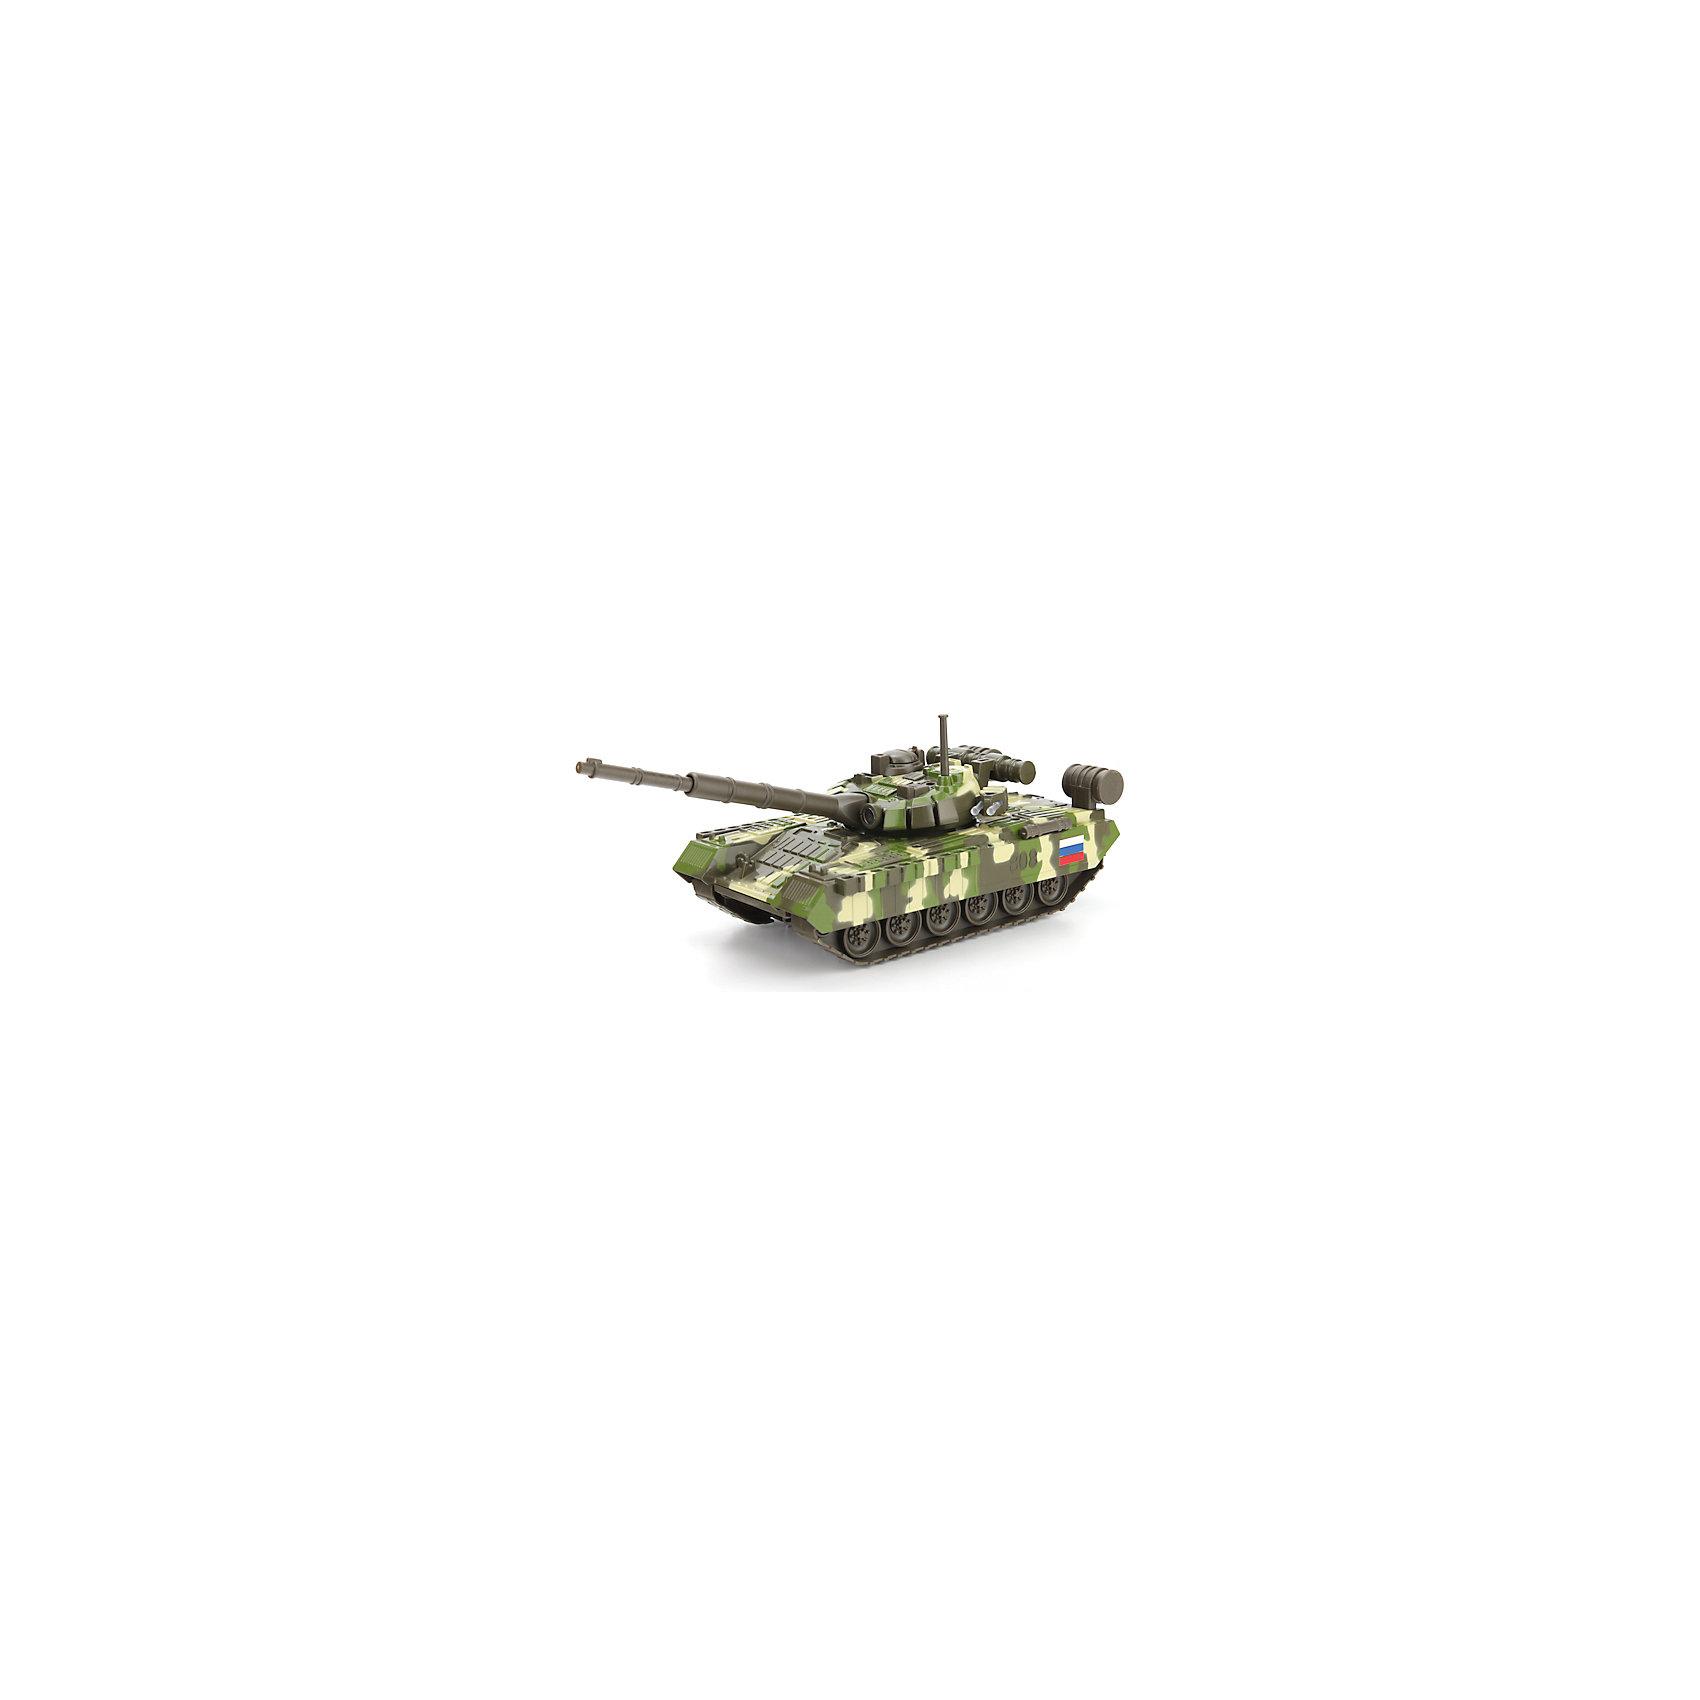 ТЕХНОПАРК Танк T-90, со светом и звуком, ТЕХНОПАРК, в ассортименте технопарк пожарная машина со светом и звуком технопарк